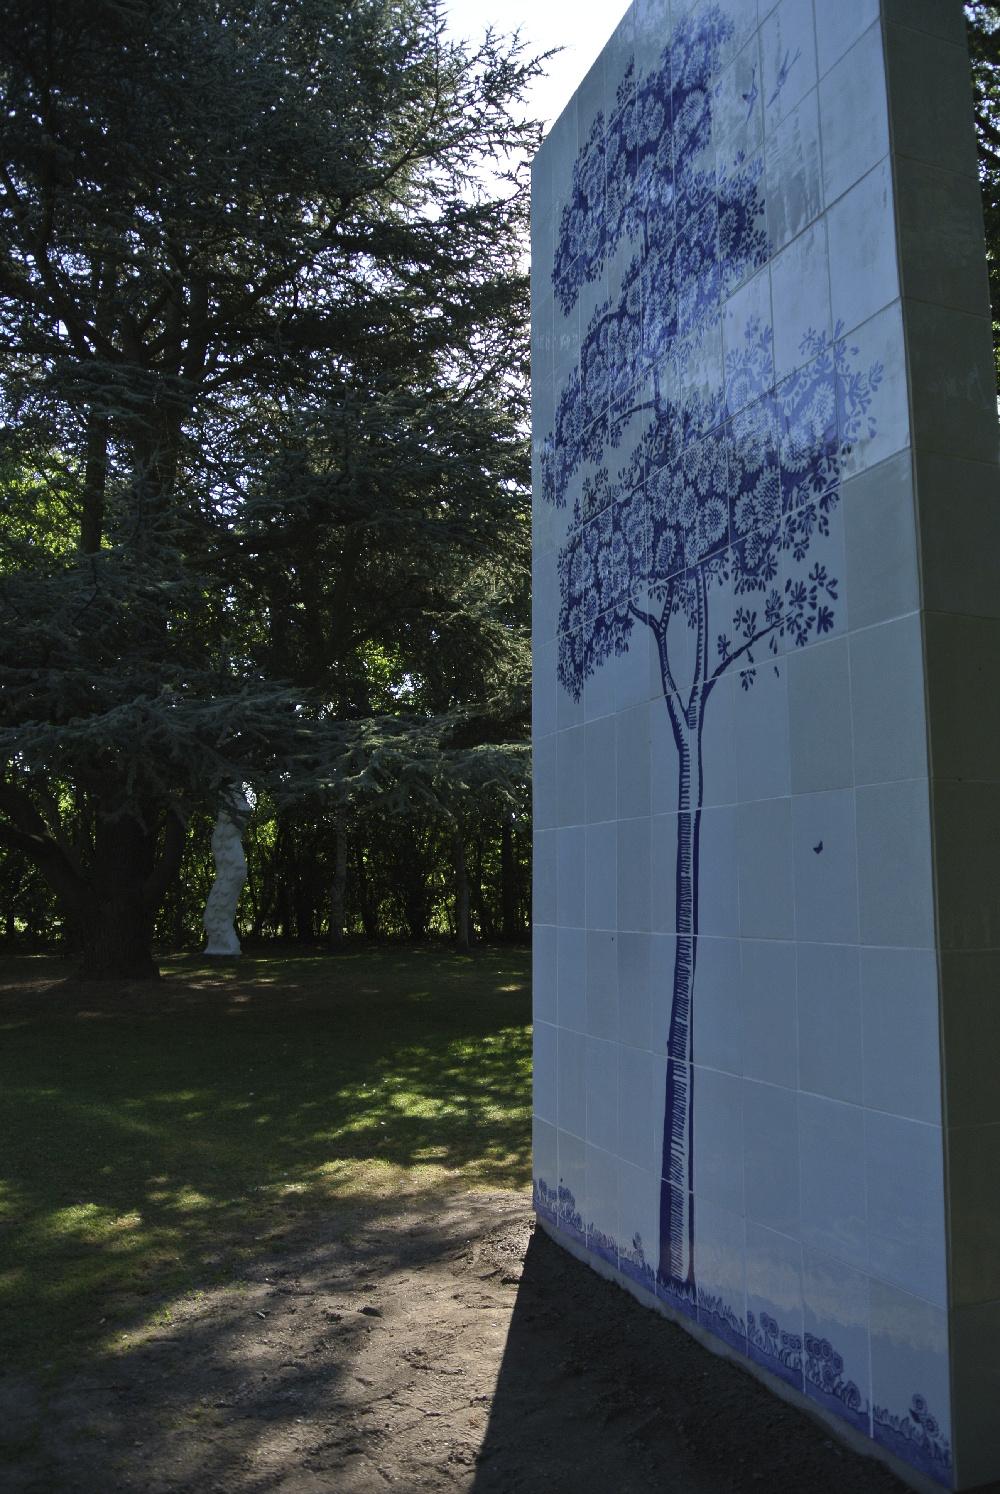 The Guldagergård Tree (after Spode) 7